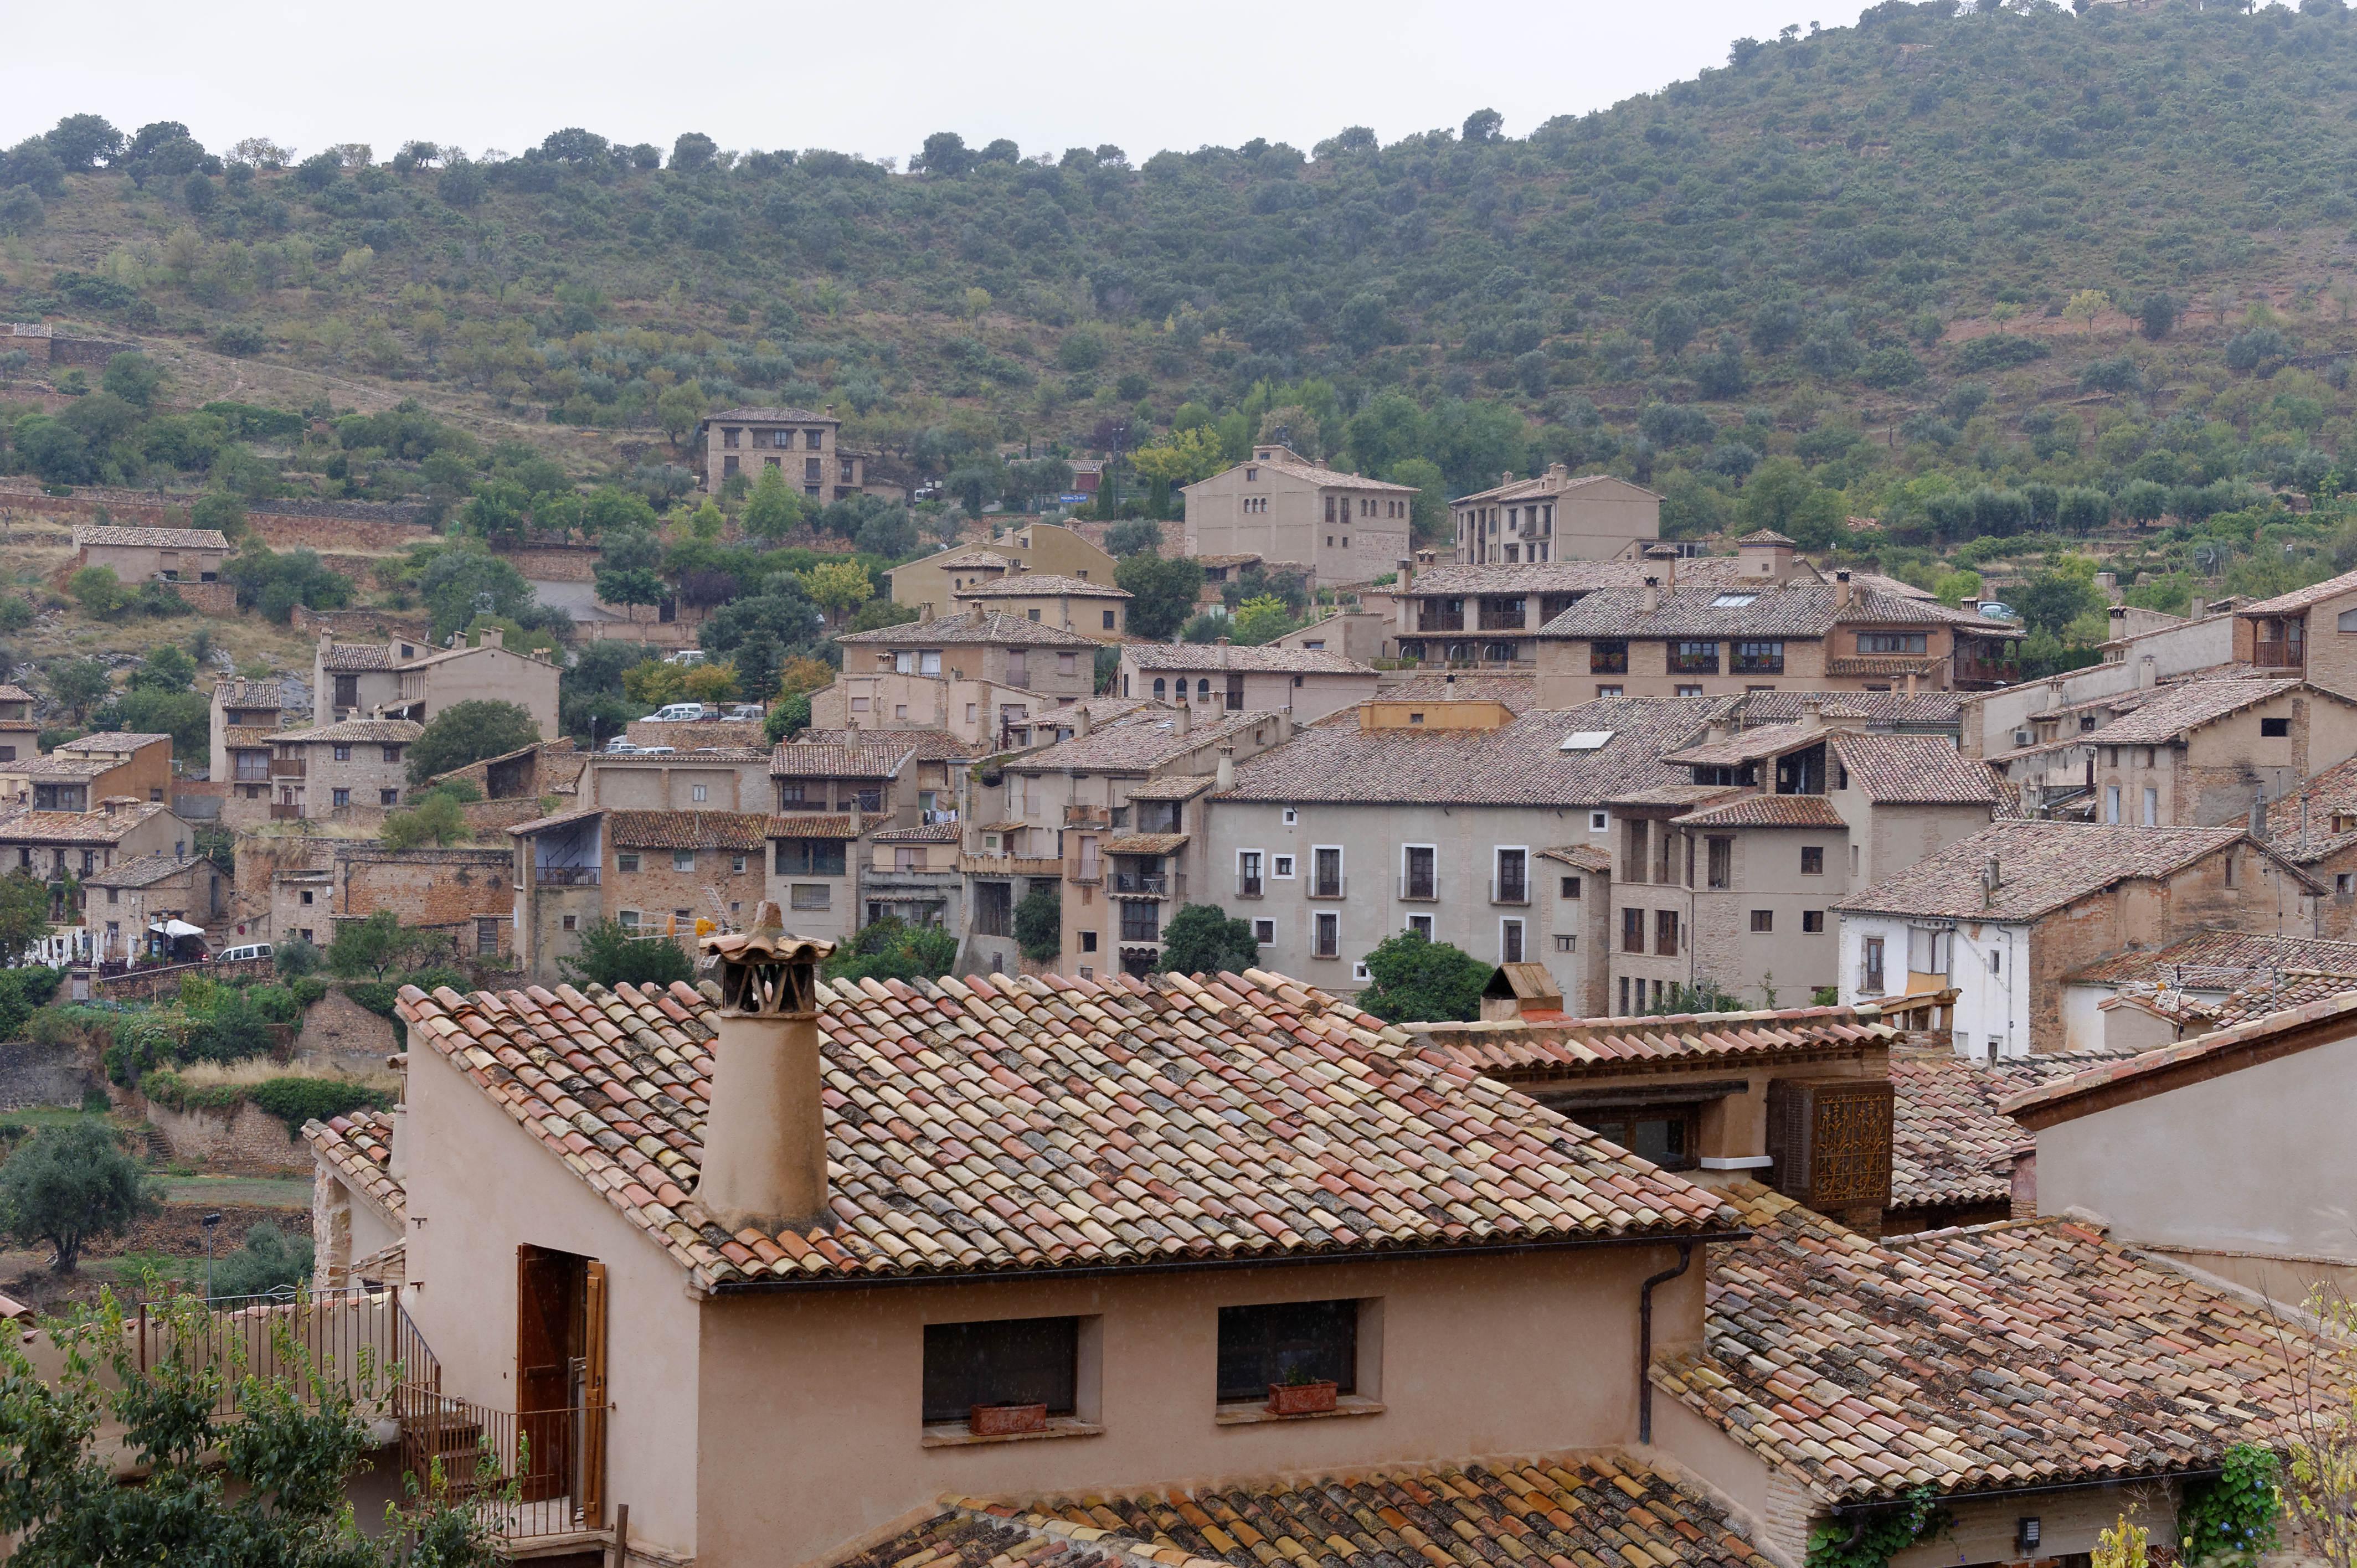 4292_Alquezar (Aragon)